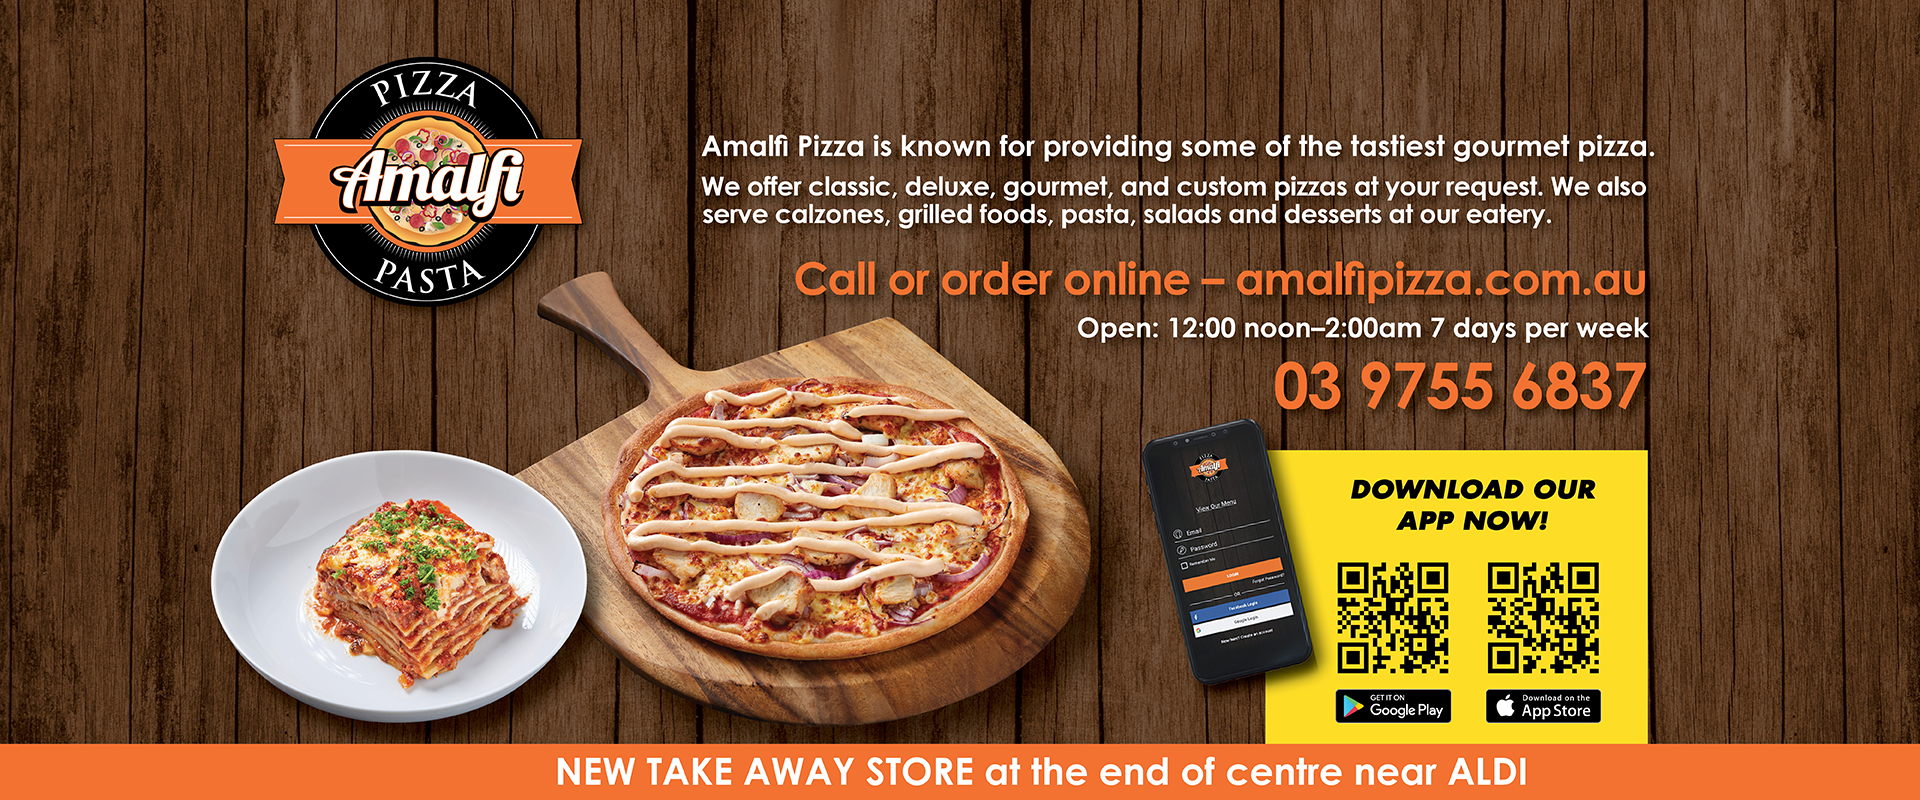 Amalfi Pizza ad